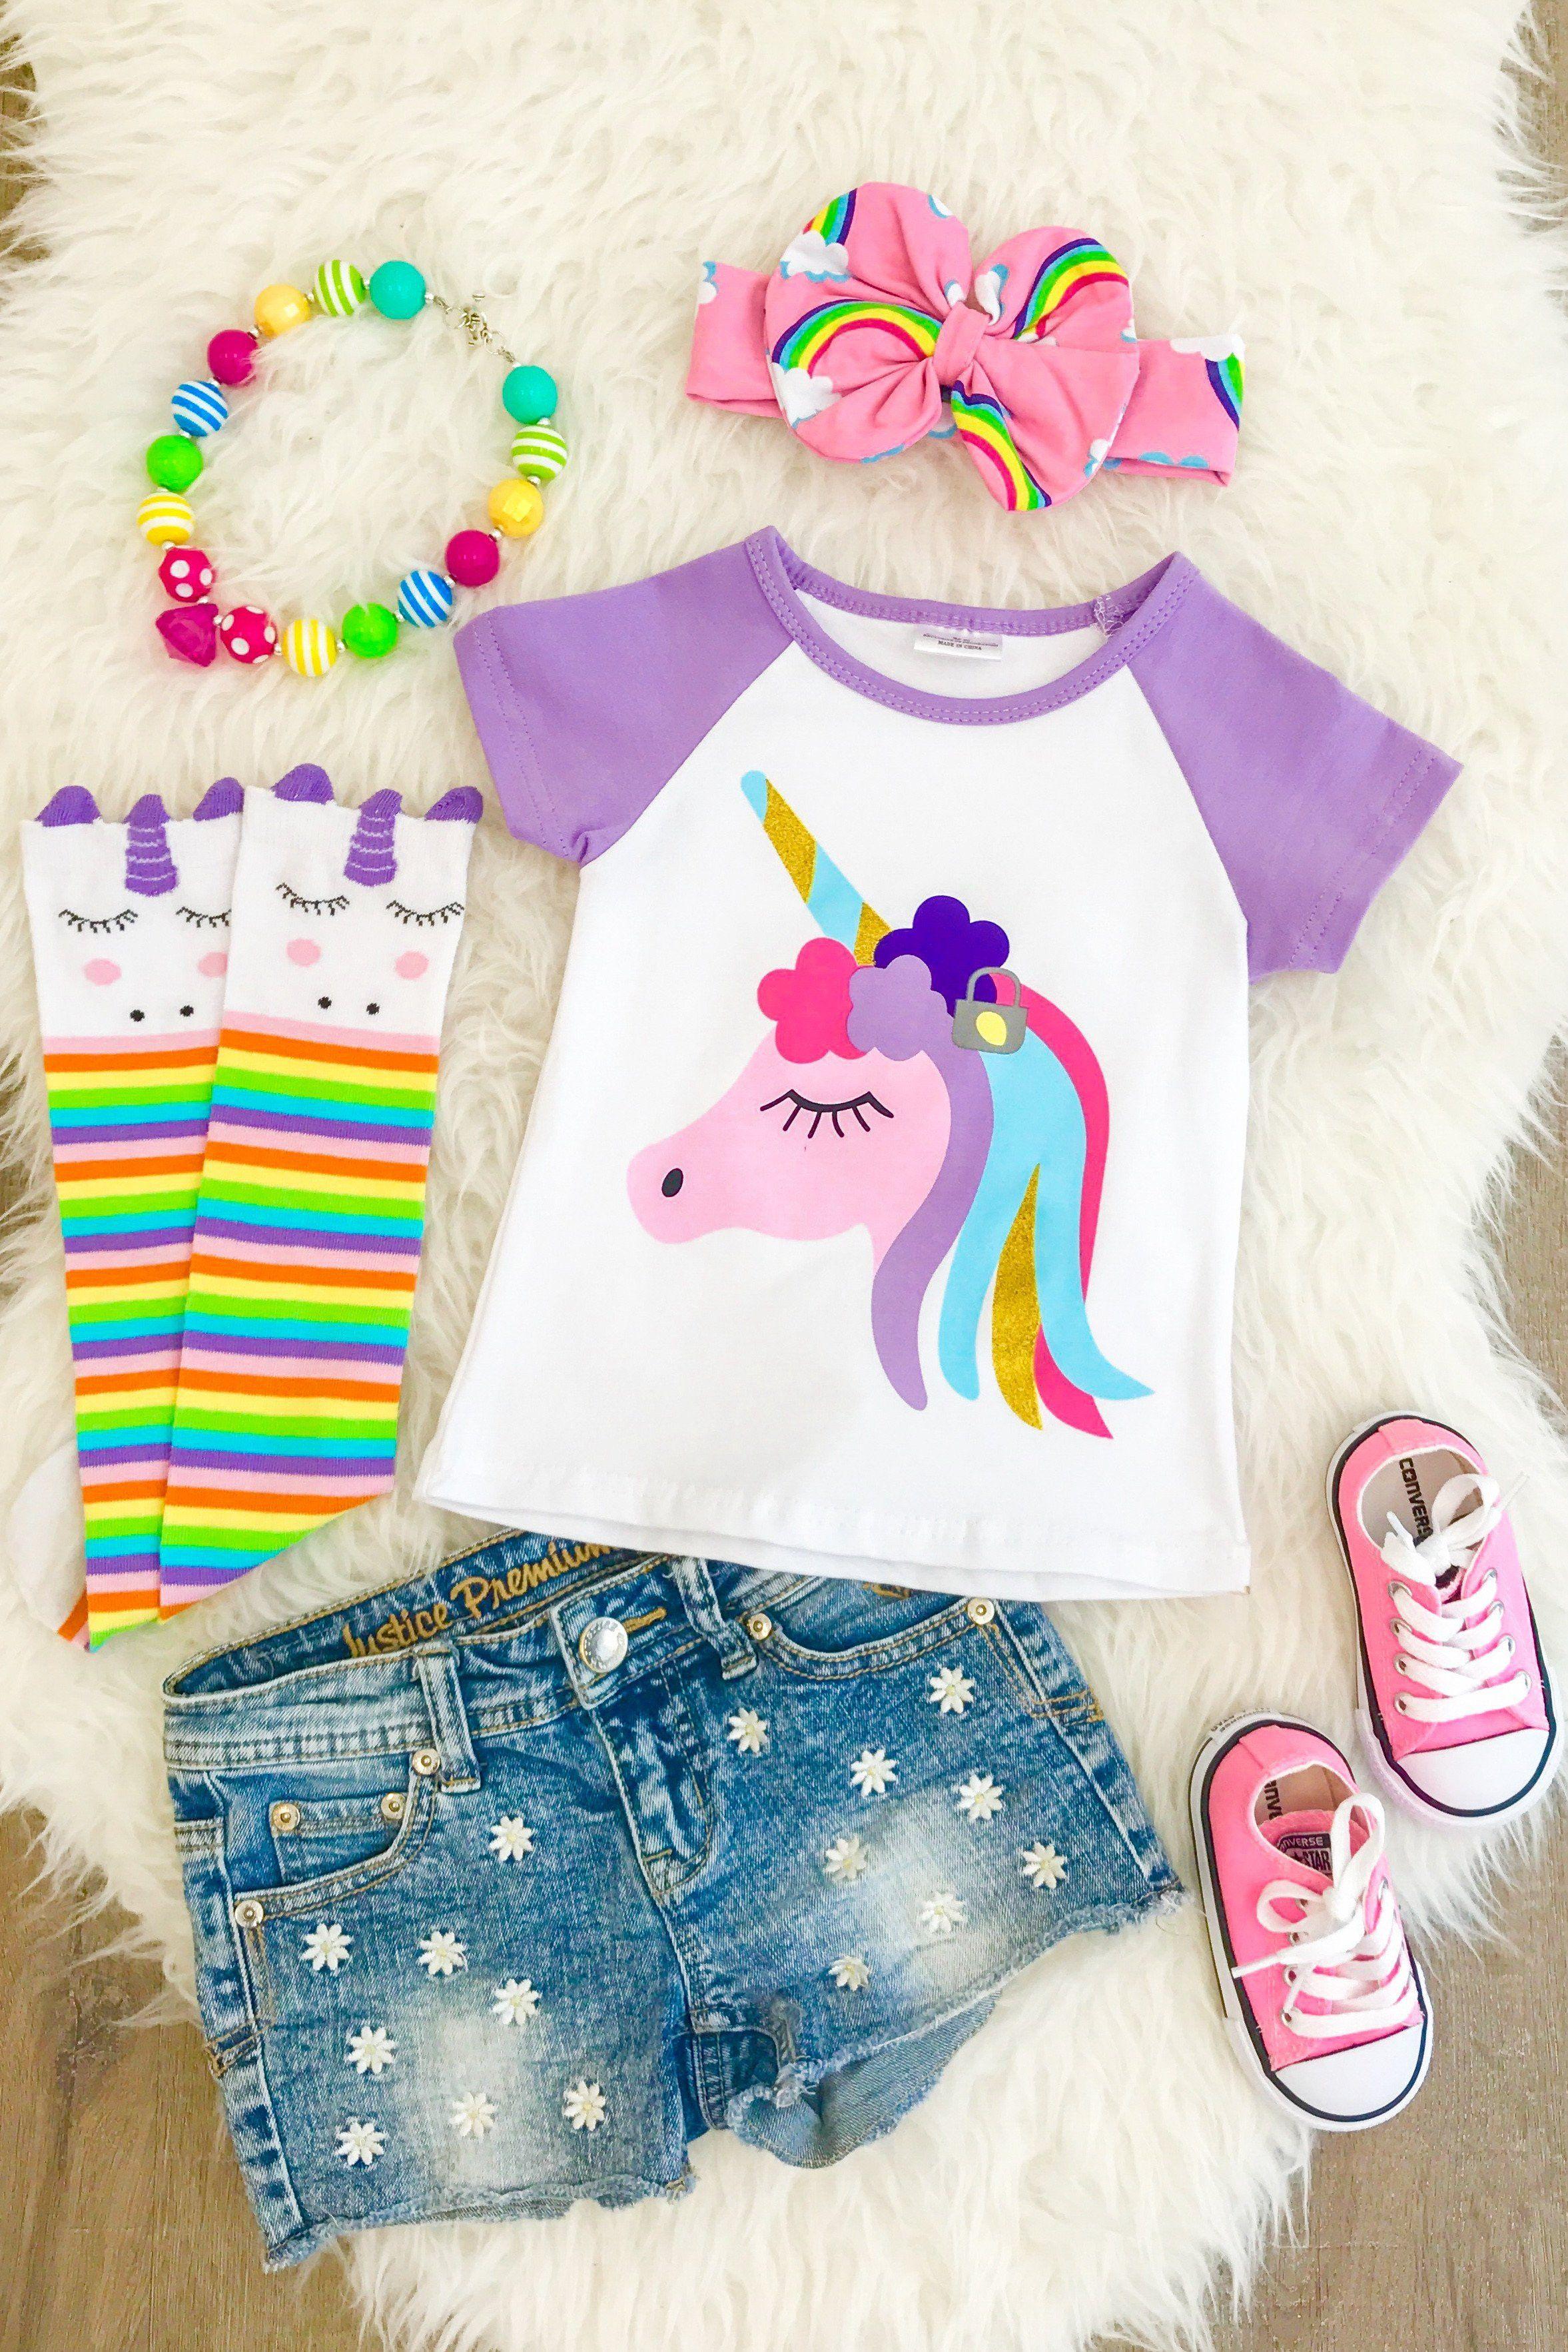 6559312ab58 Lavendar Unicorn T-Shirt. Lavendar Unicorn T-Shirt Little Girl ...